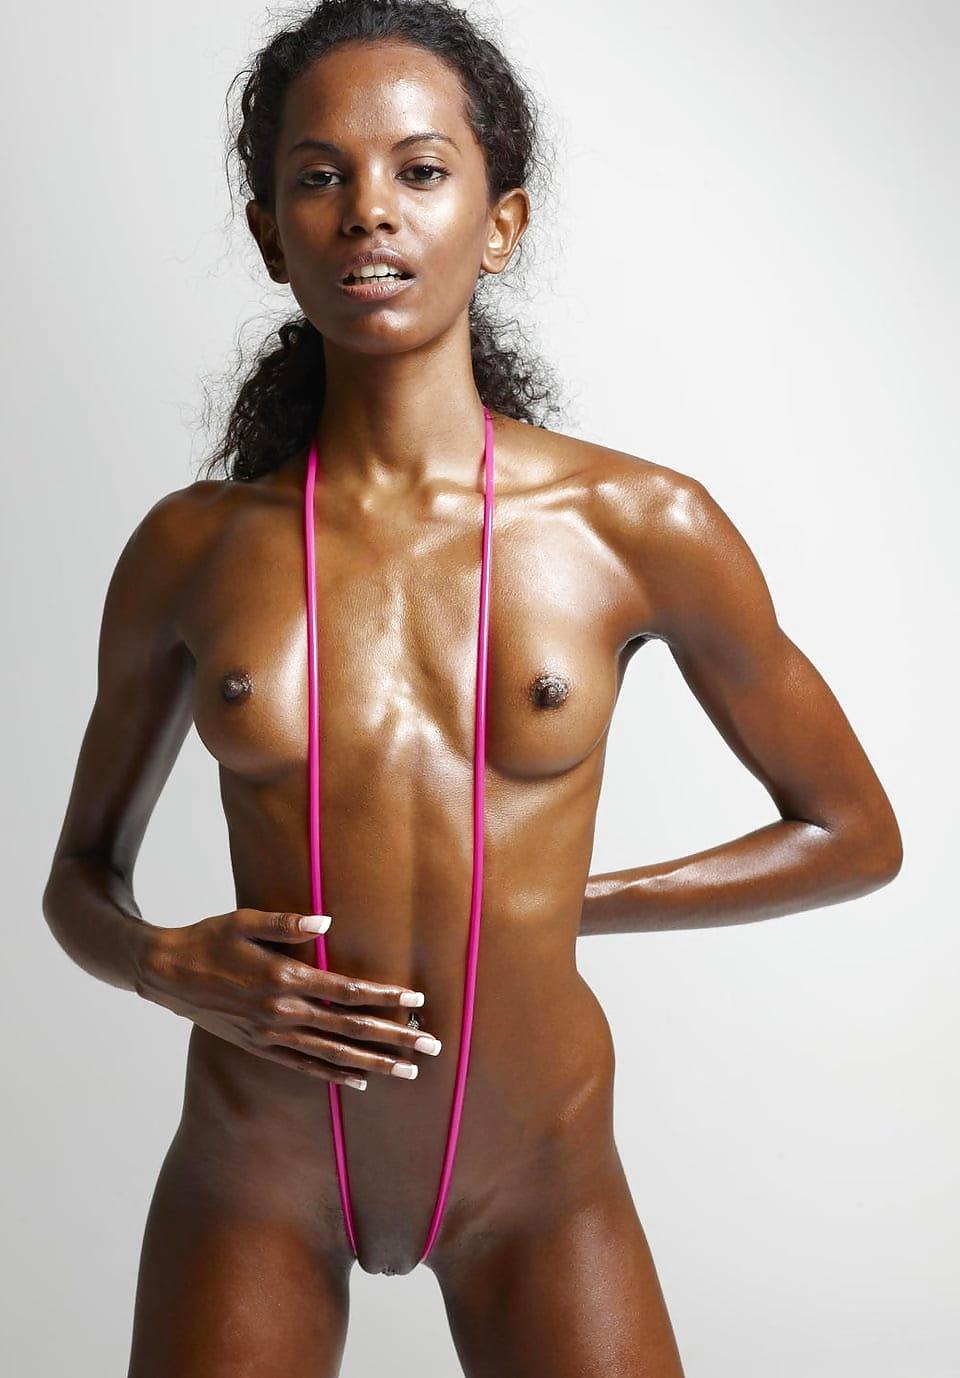 women Nude hot black